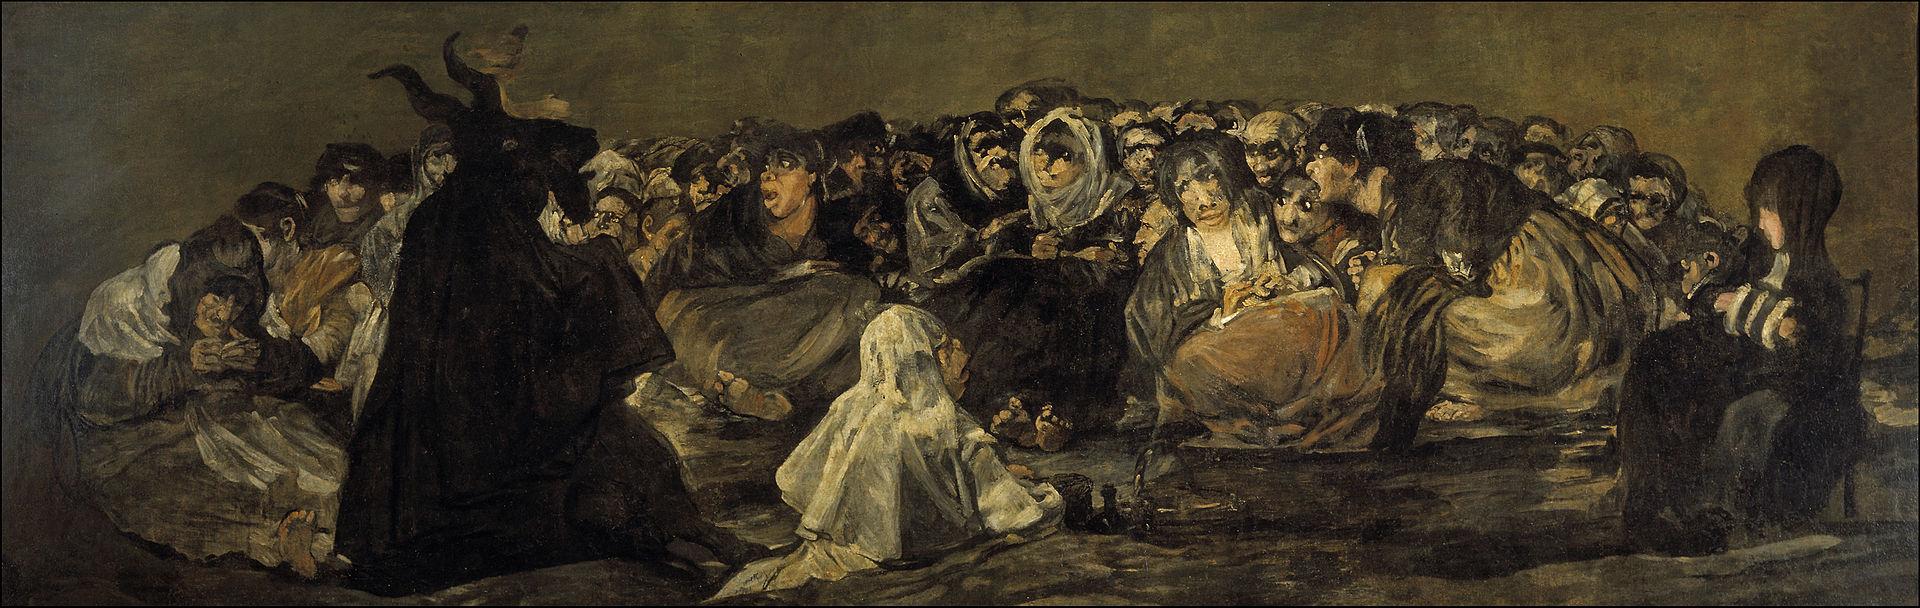 De heksensabbat/Francisco Goya